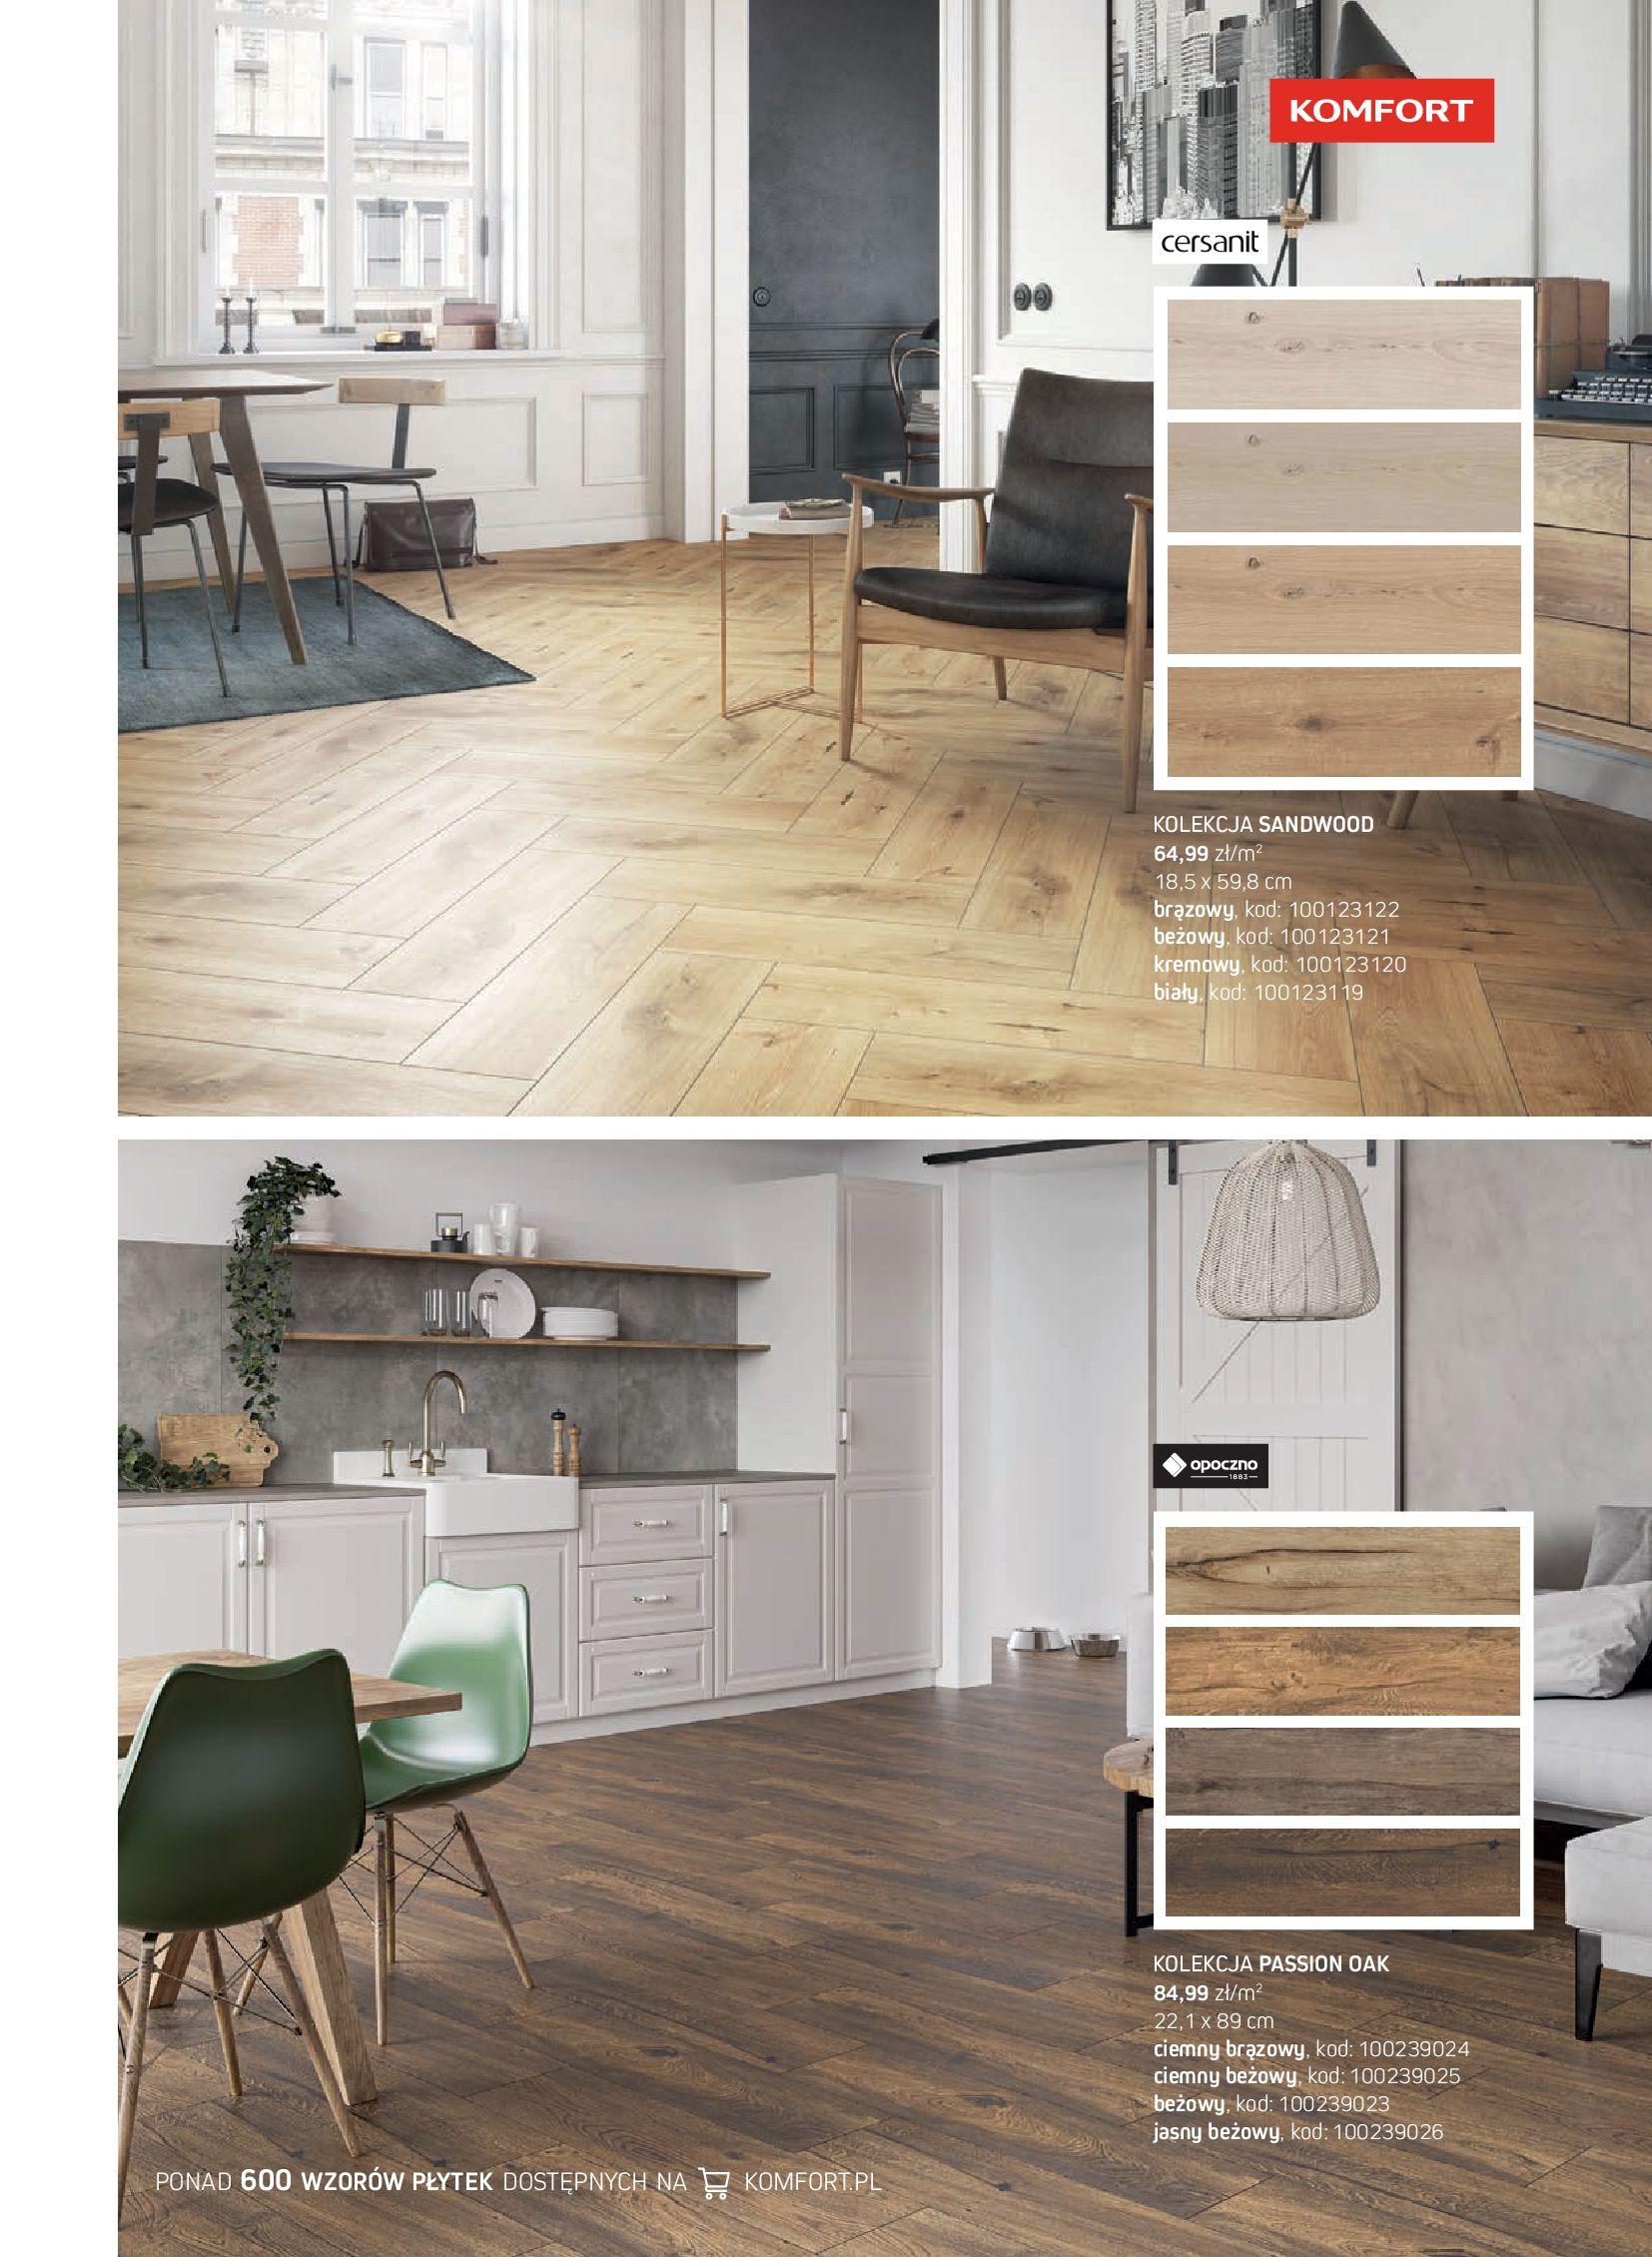 Gazetka Komfort: Gazetka Komfort - Katalog podłogi i drzwi 2021-06-16 page-51